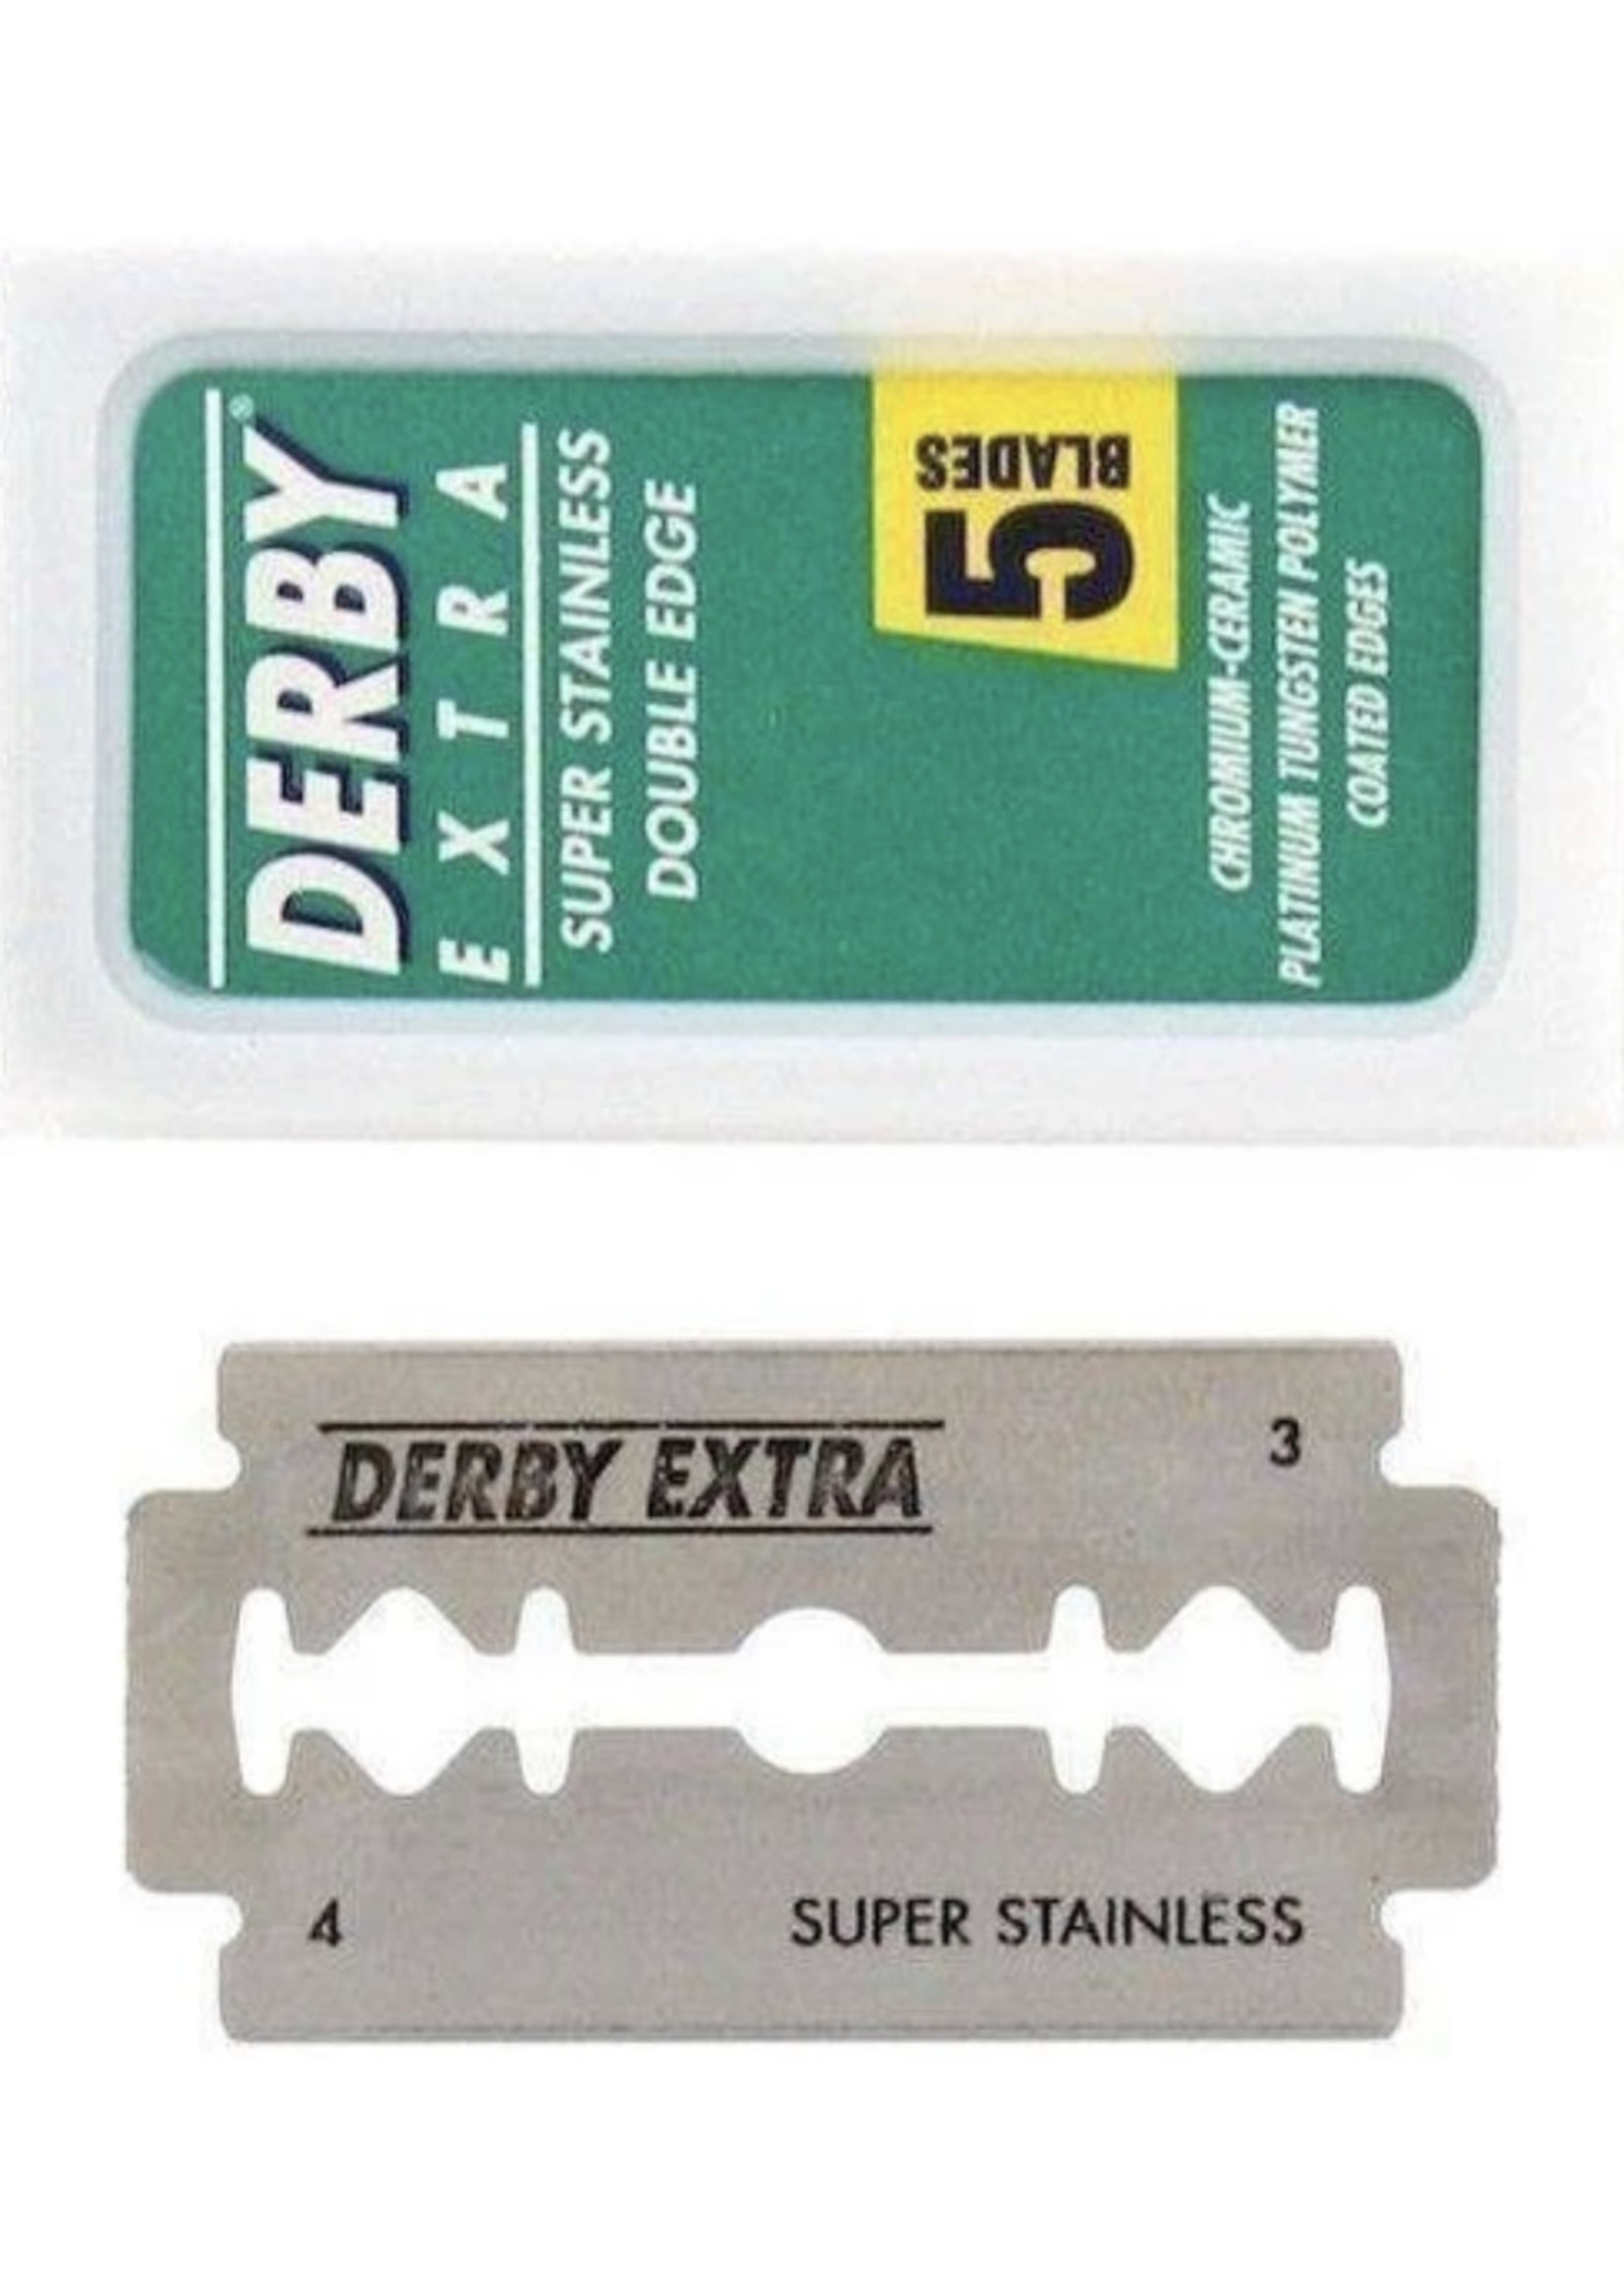 Derby Stainless Double Edge Razor Blades